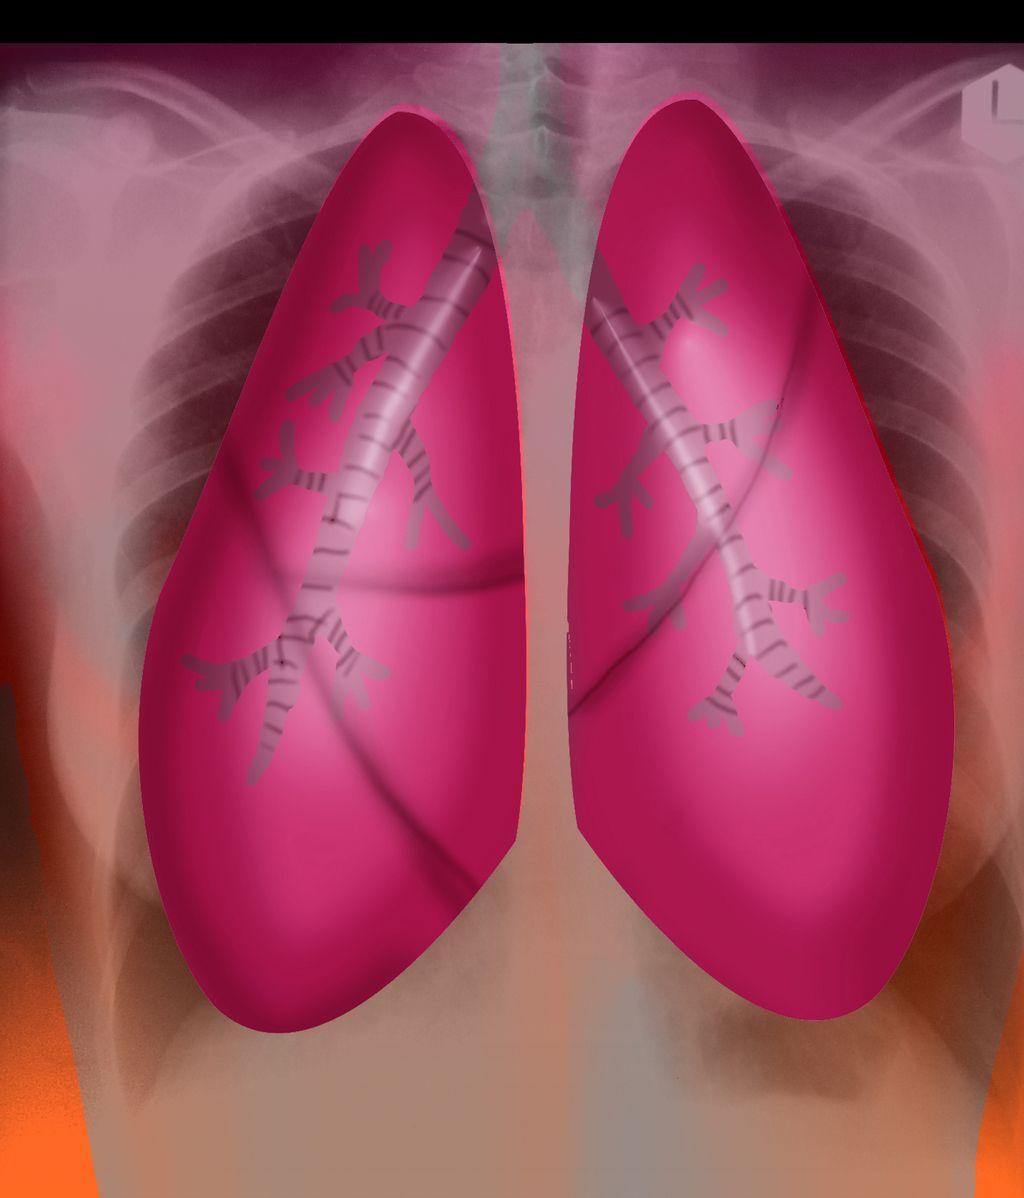 Pulmones.